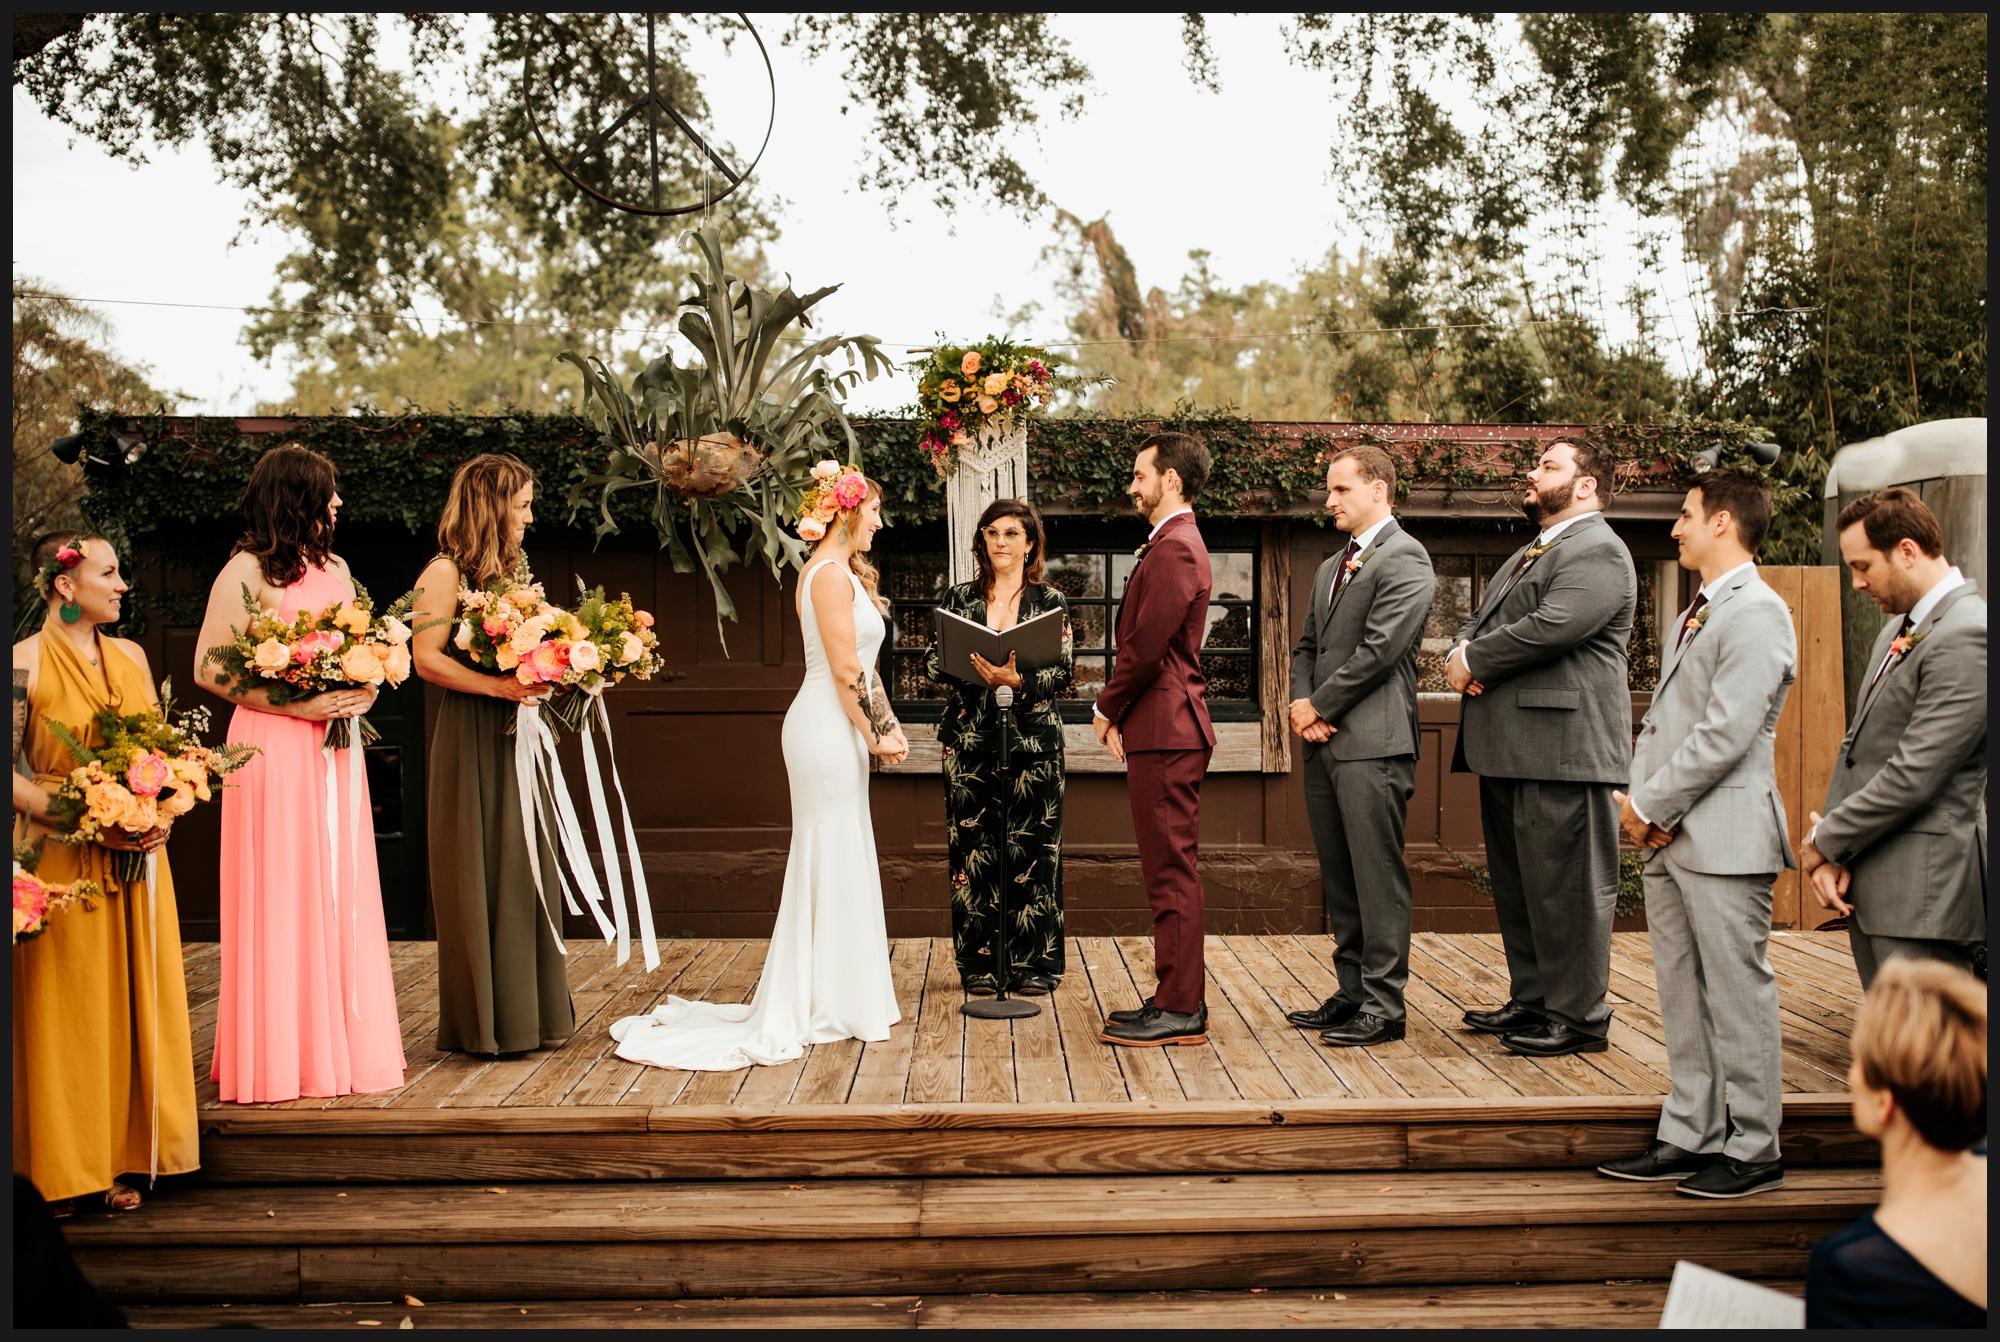 Orlando-Wedding-Photographer-destination-wedding-photographer-florida-wedding-photographer-bohemian-wedding-photographer_2008.jpg